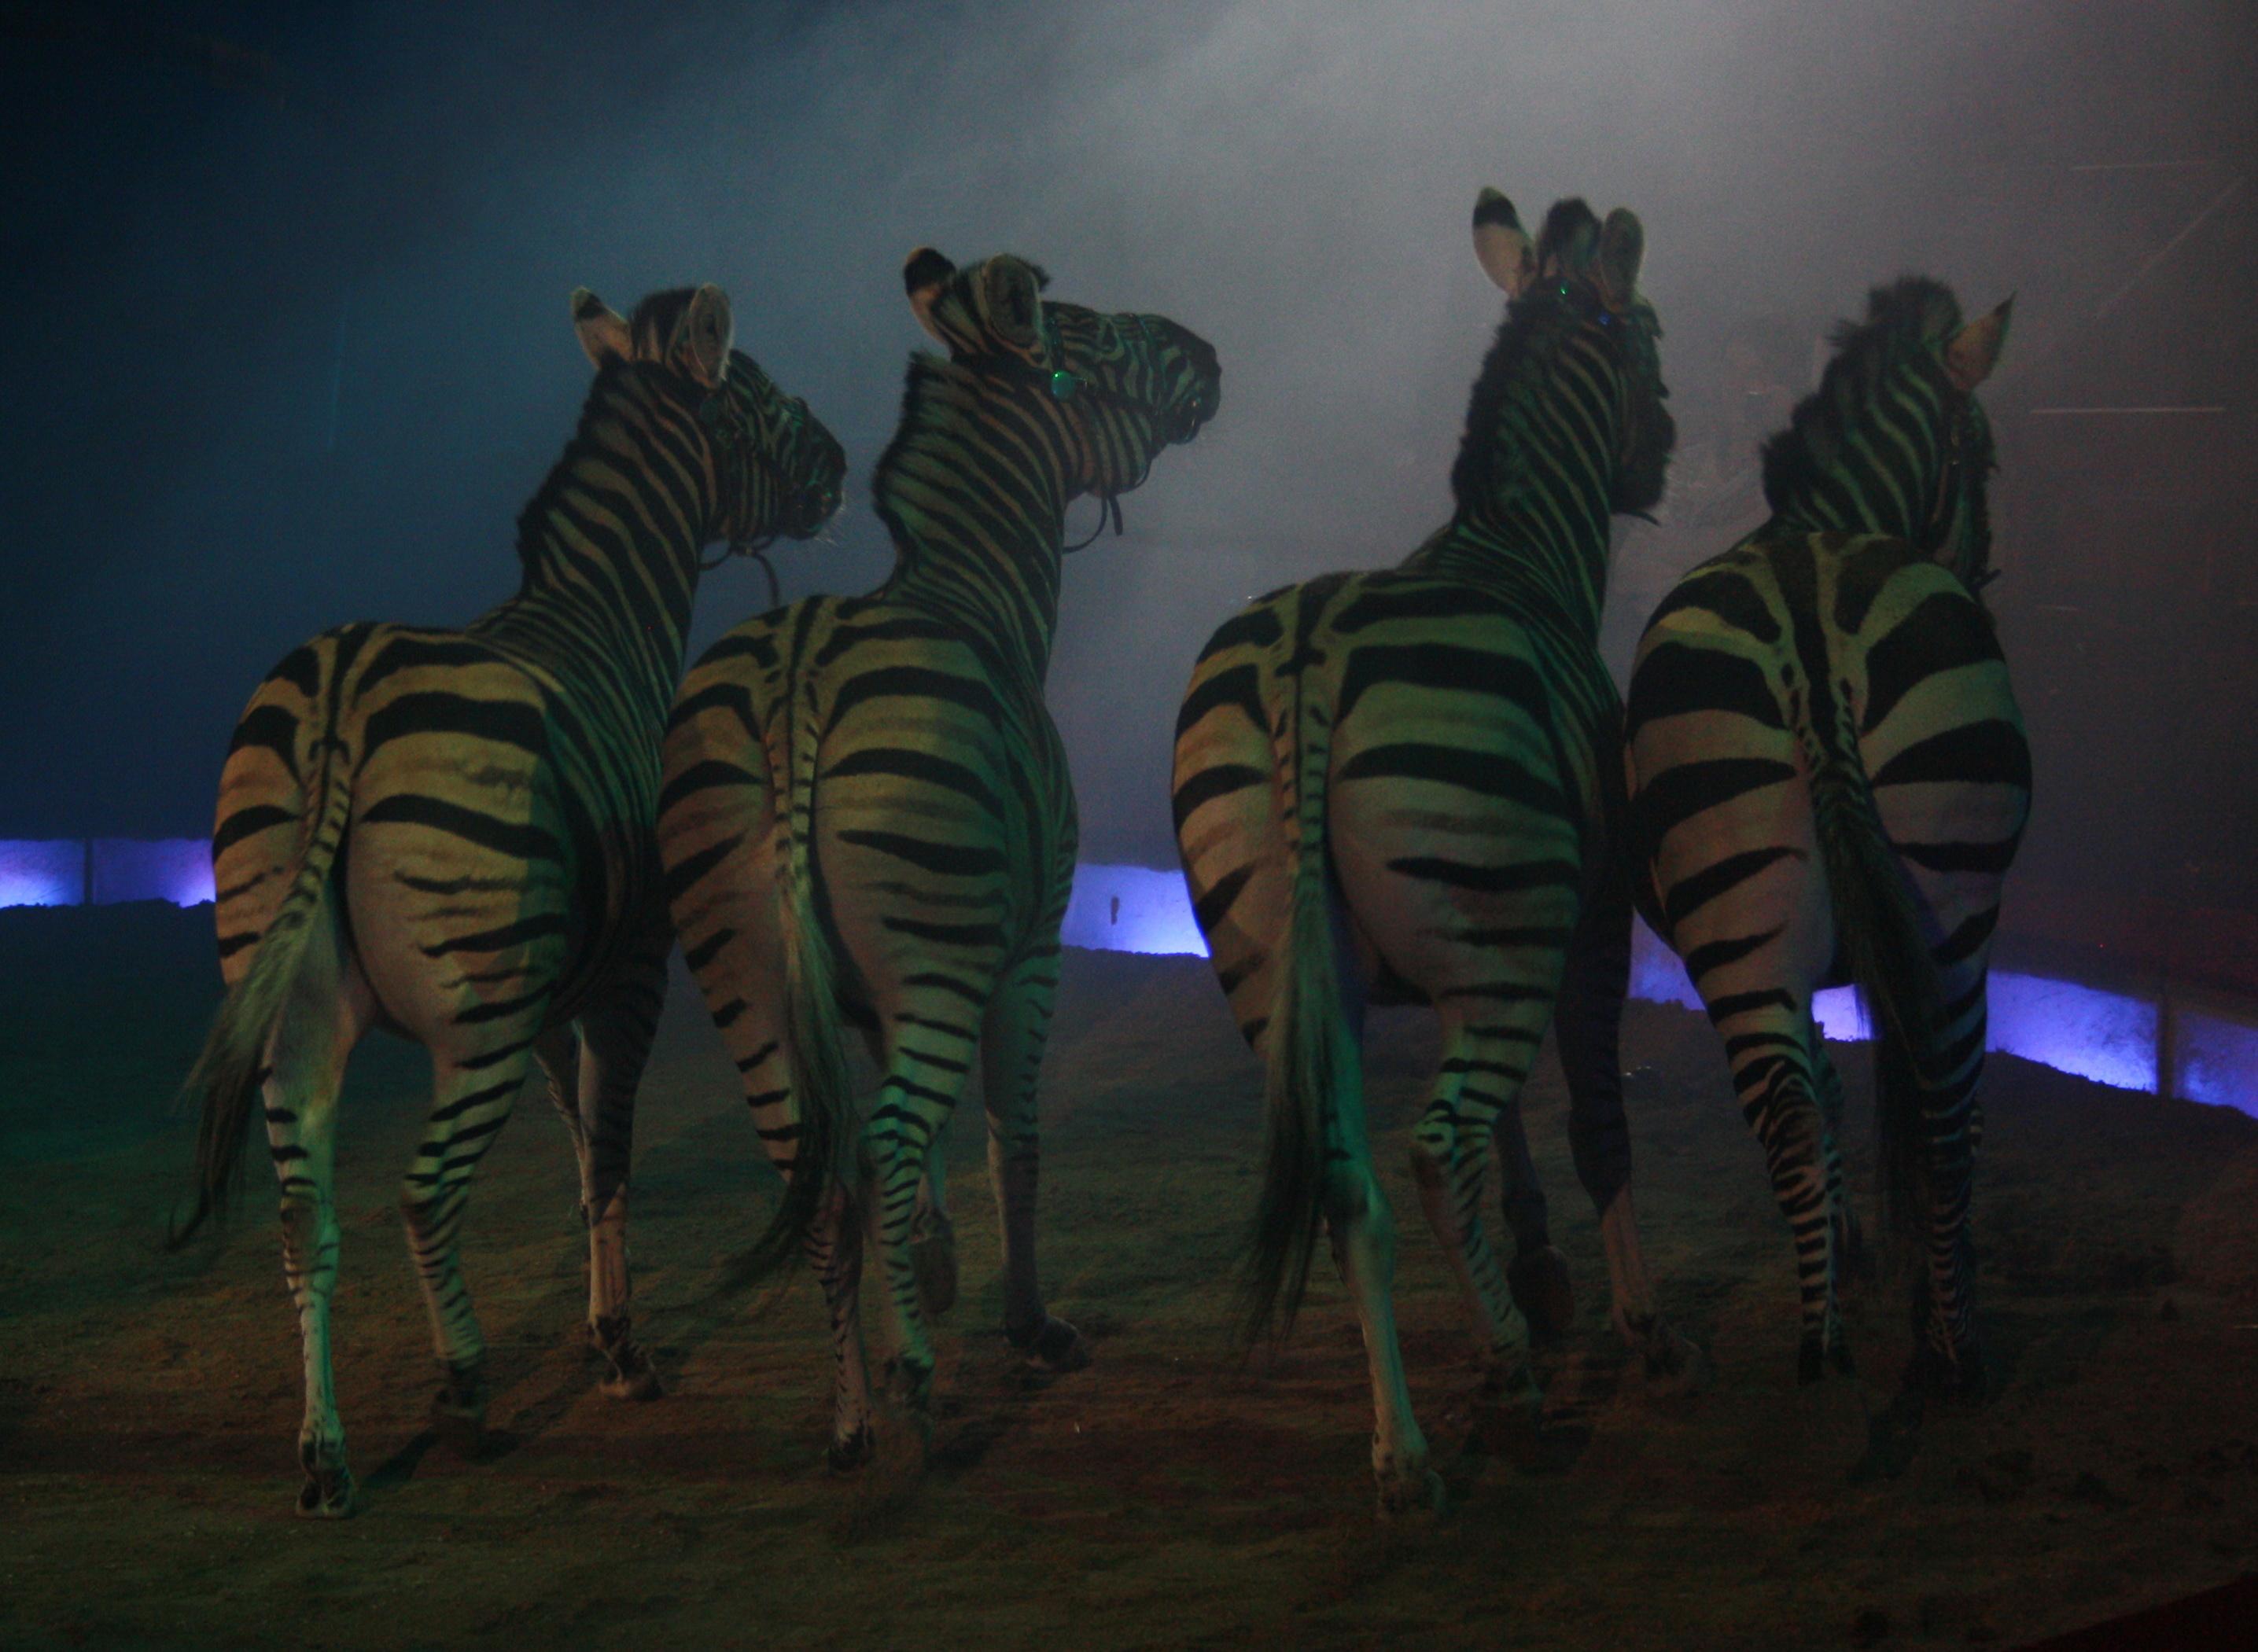 Zebras im Zirkus